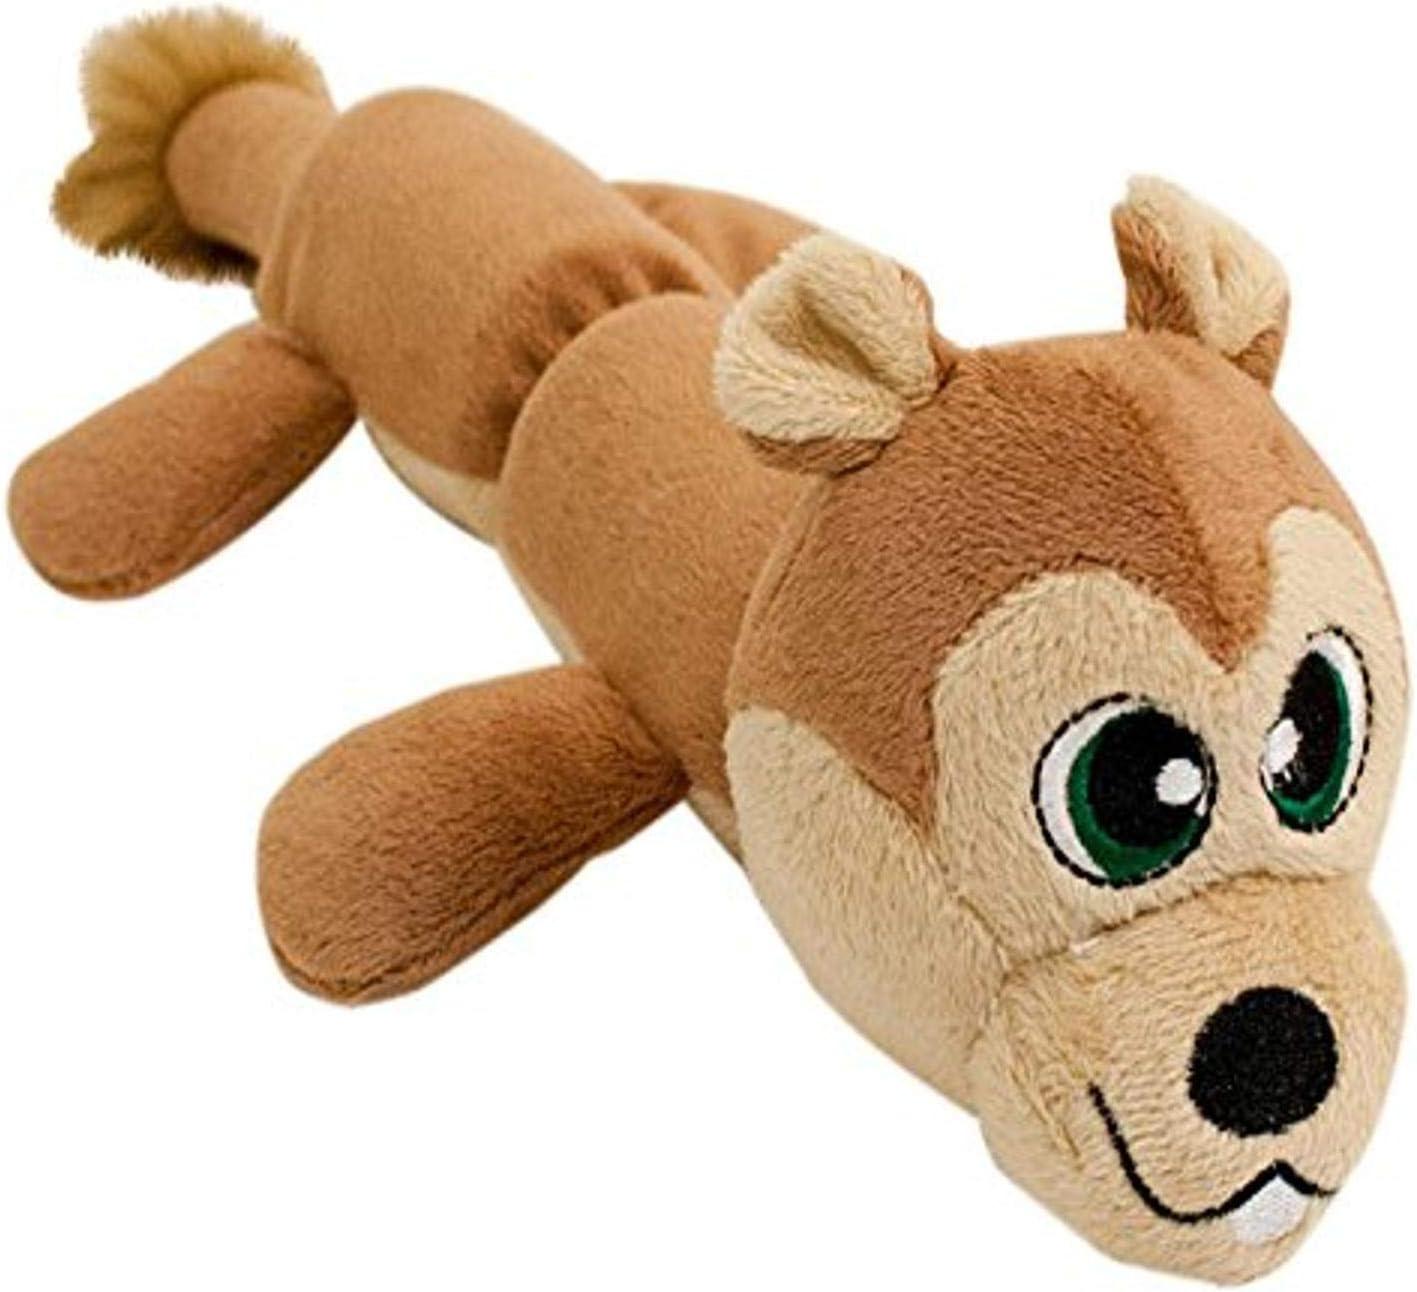 Hyper Large discharge sale Pet Cozy Import Critter Toys Skinz Plush Dog